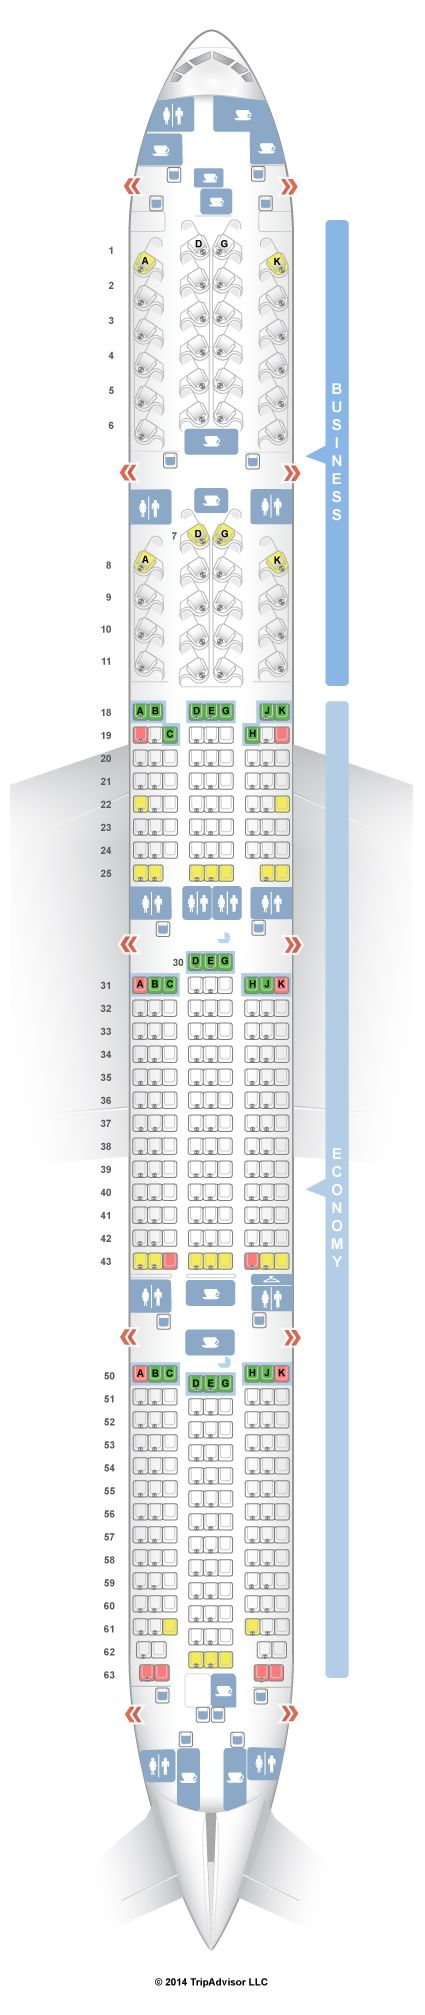 SeatGuru Seat Map Air Canada Boeing 777-300ER (77W) Two Class